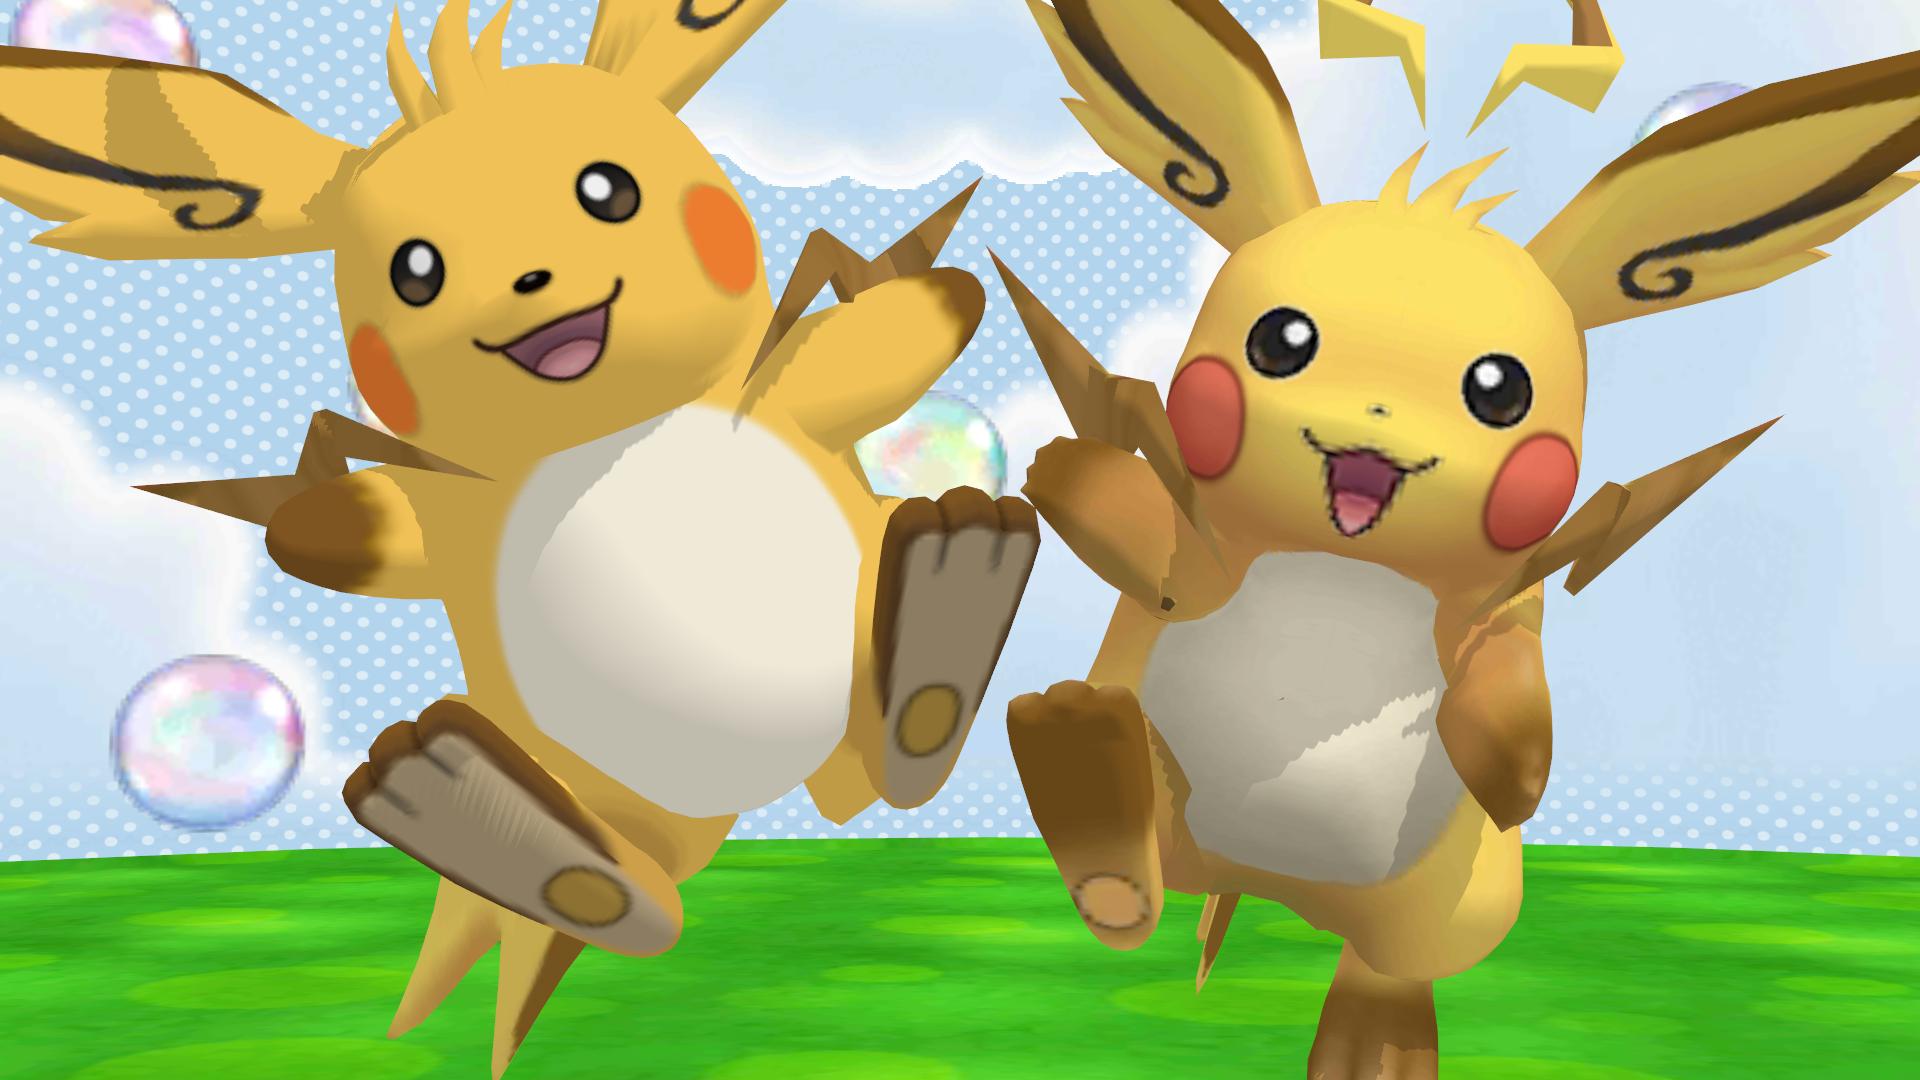 Mega raichu pockettown x pokemon xy by guiltronprime on - Pokemon x raichu mega evolution ...